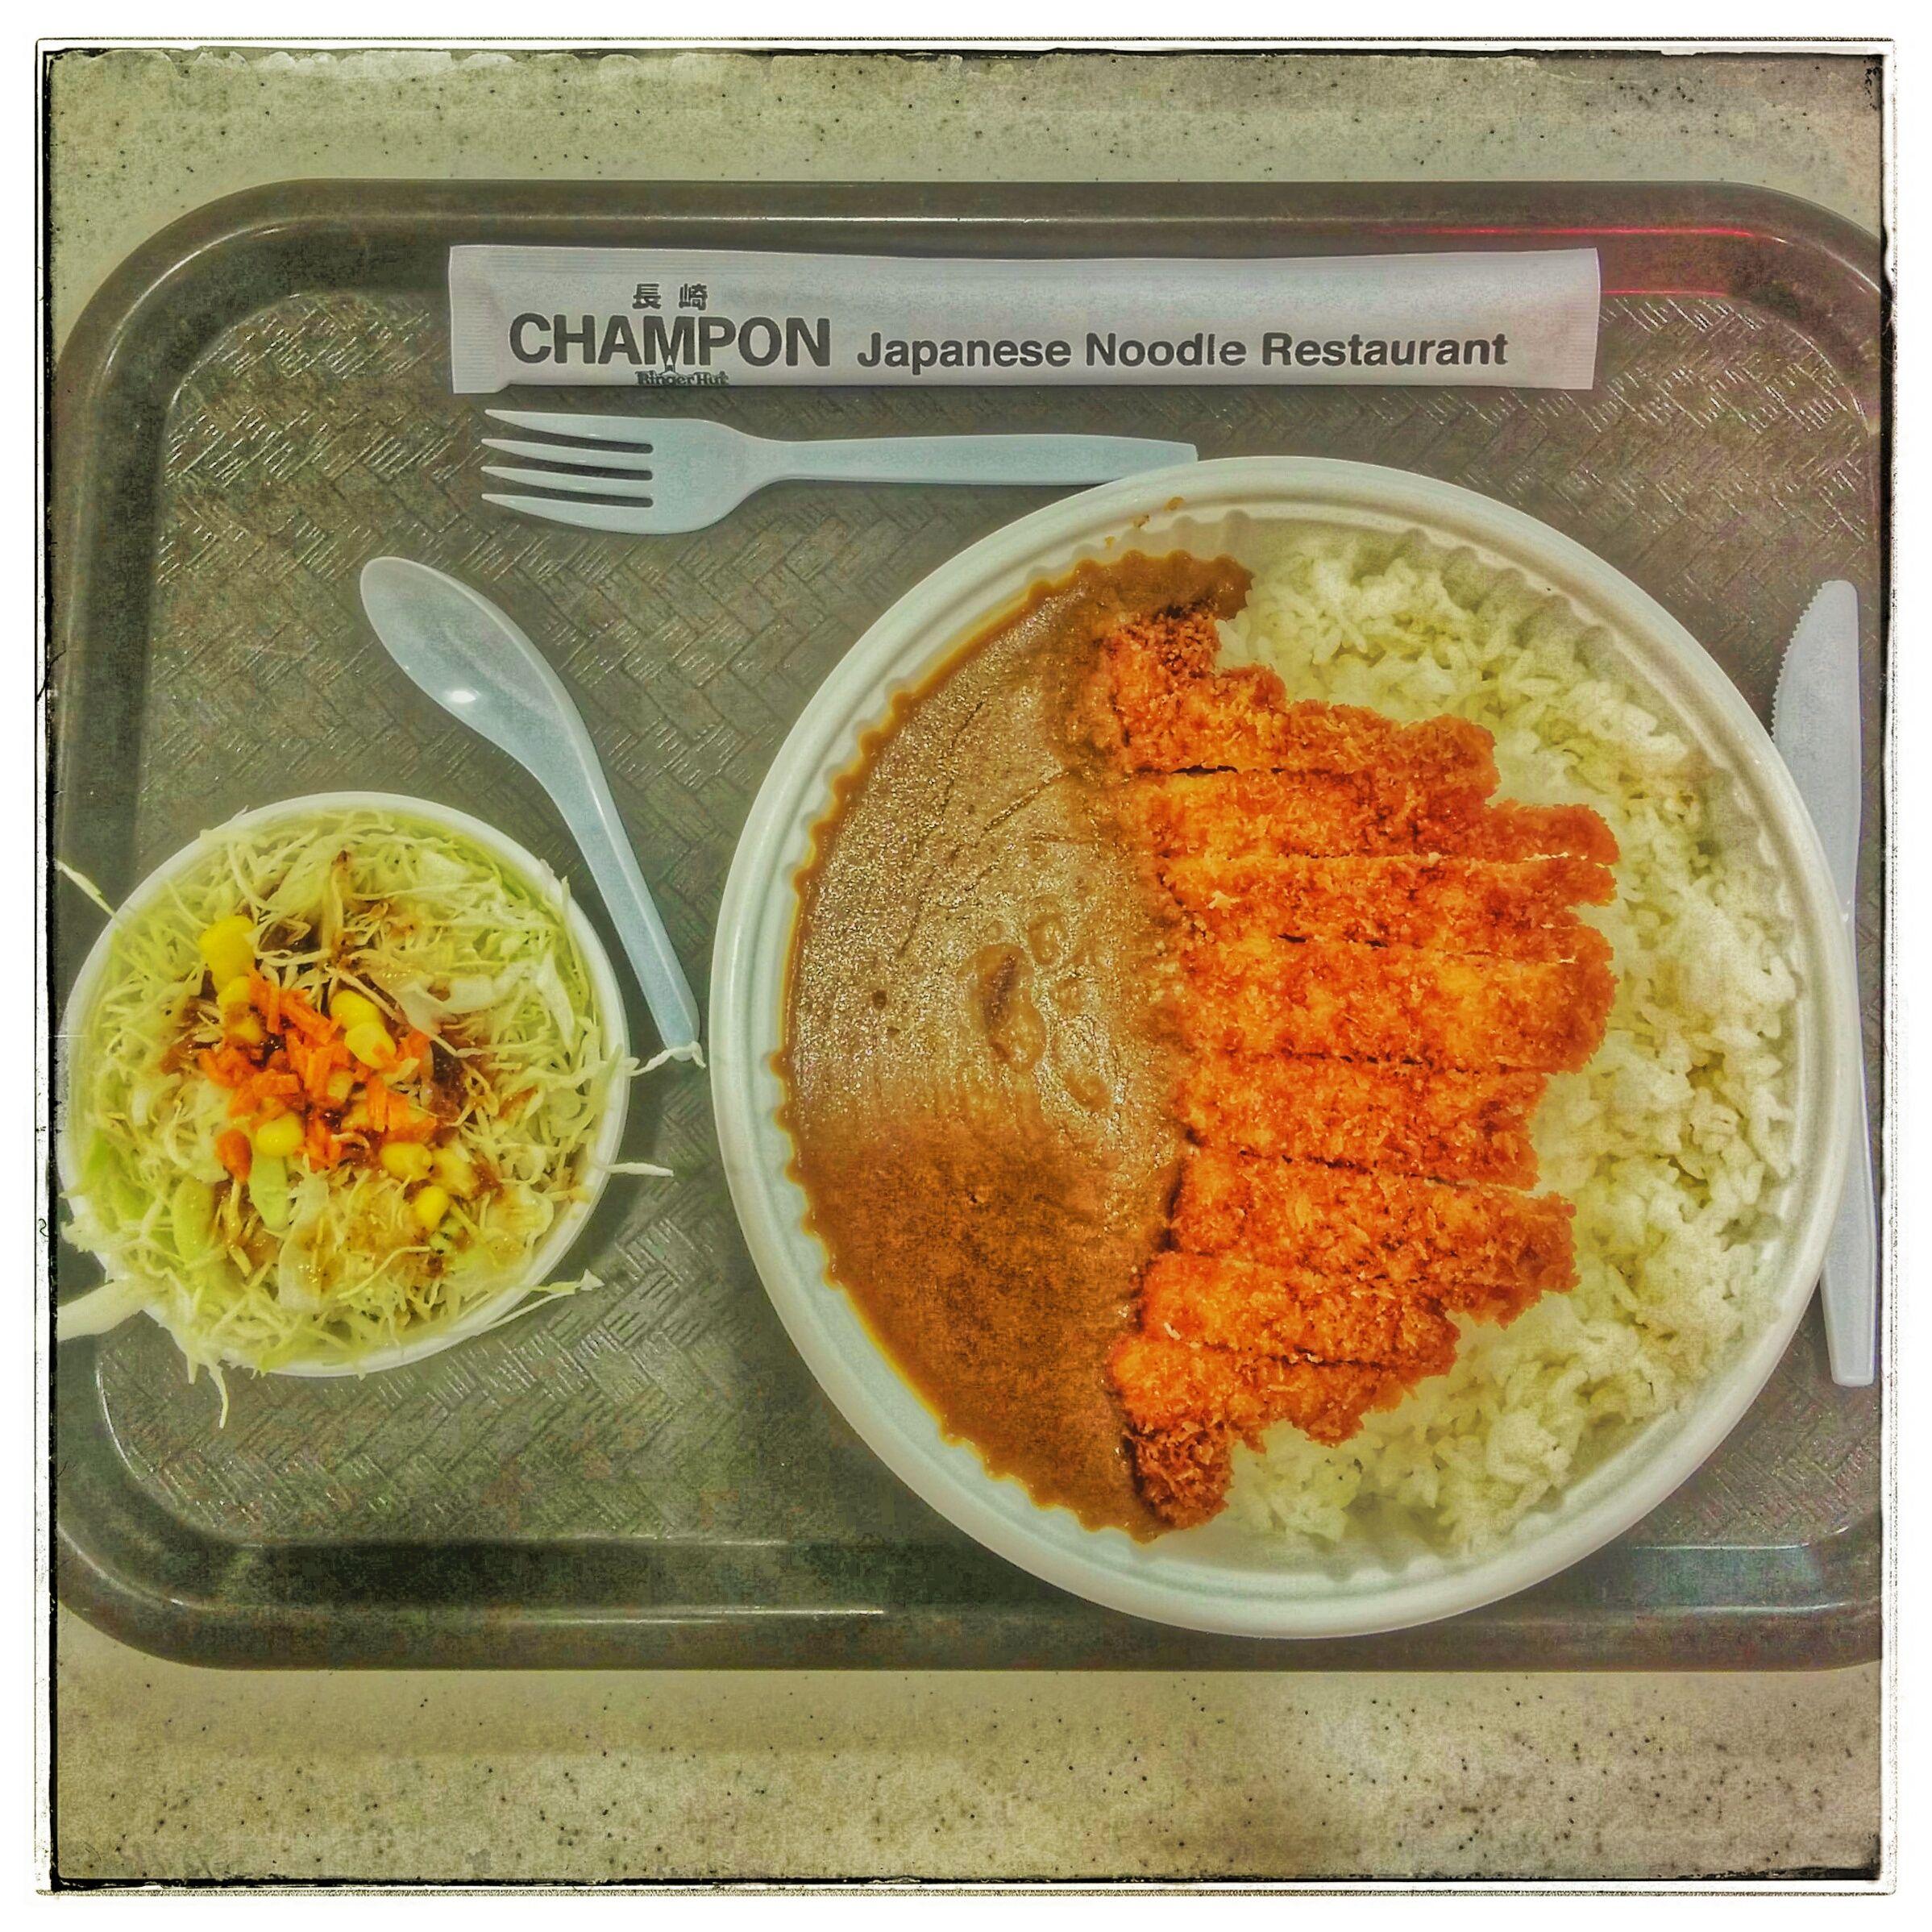 Late lunch #PorkKatsuCurry